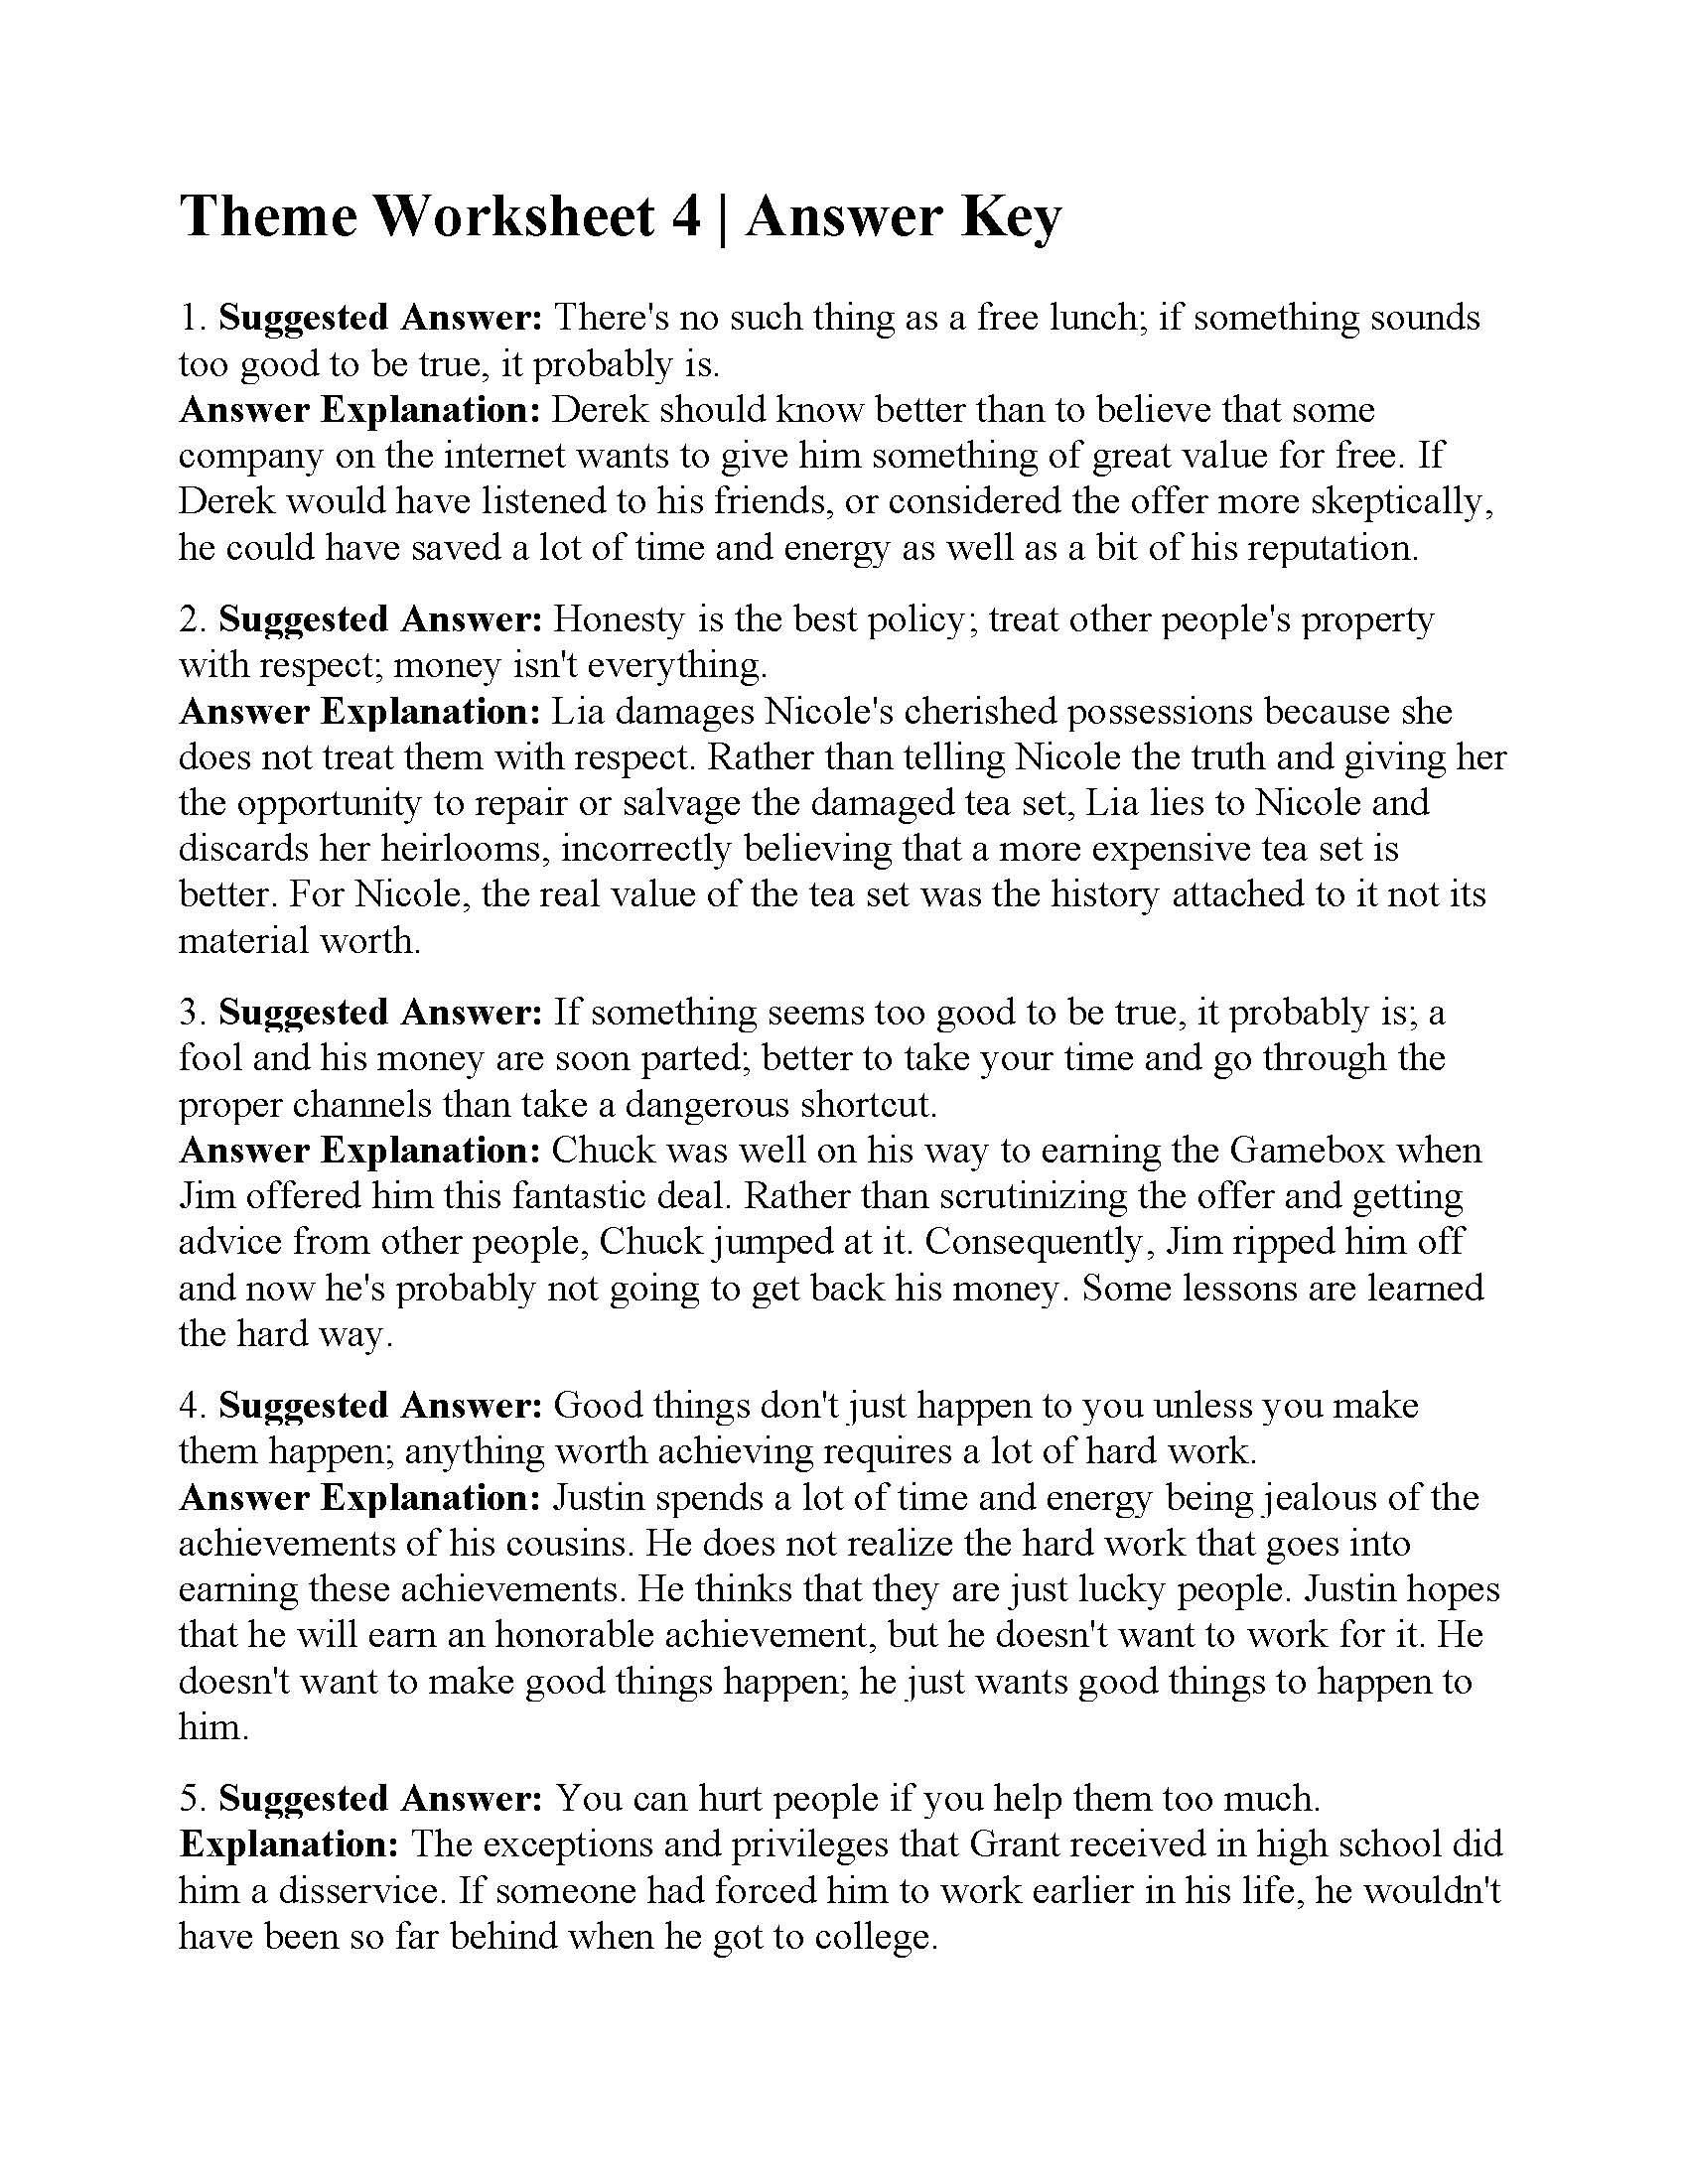 Theme Worksheets 5th Grade theme Worksheet 4